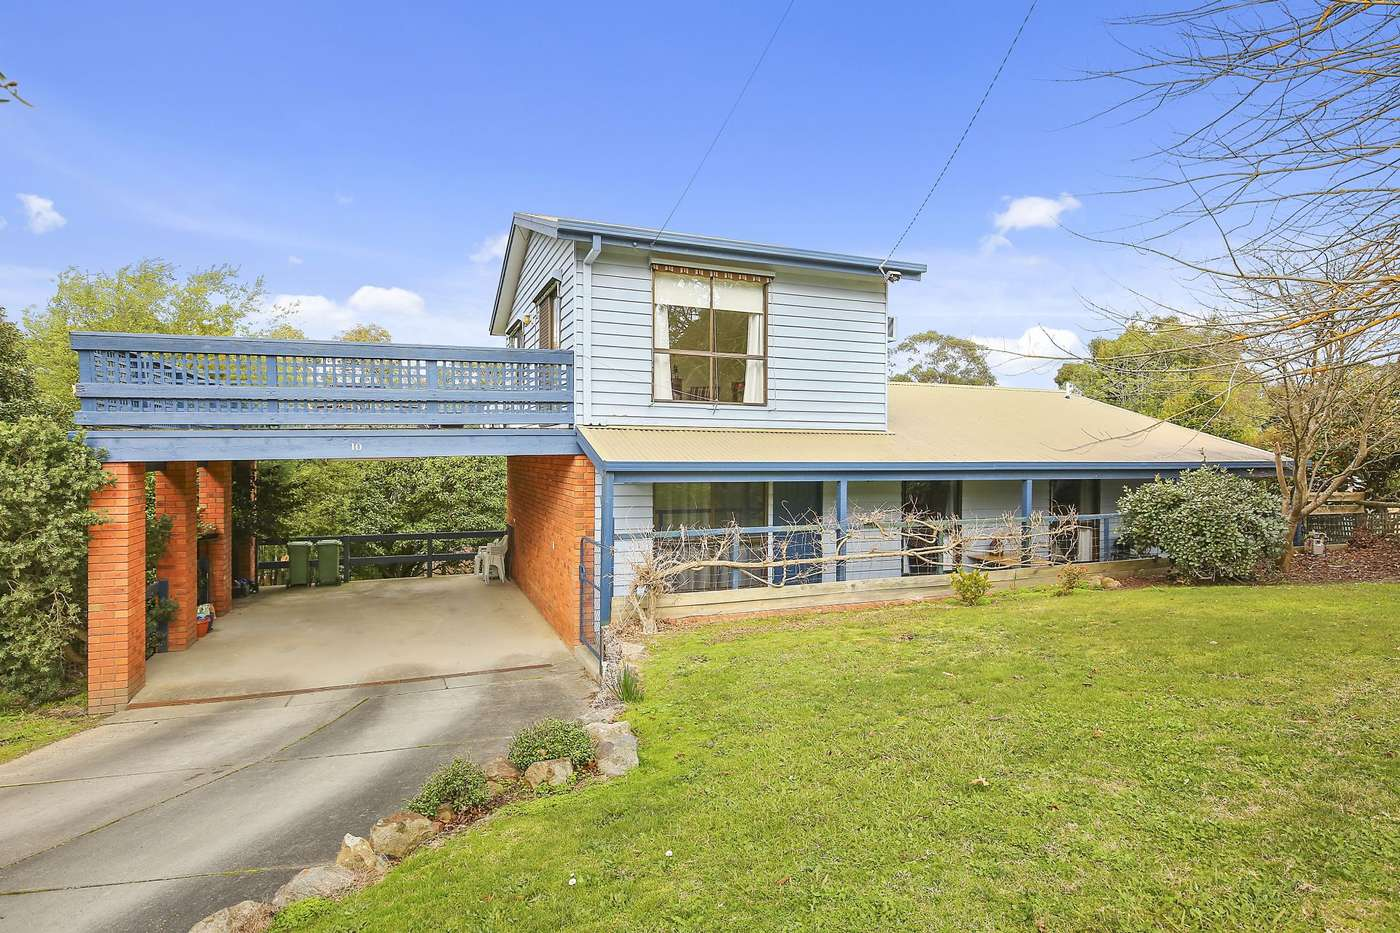 Main view of Homely house listing, 10 Tarranna Grove, Chum Creek, VIC 3777